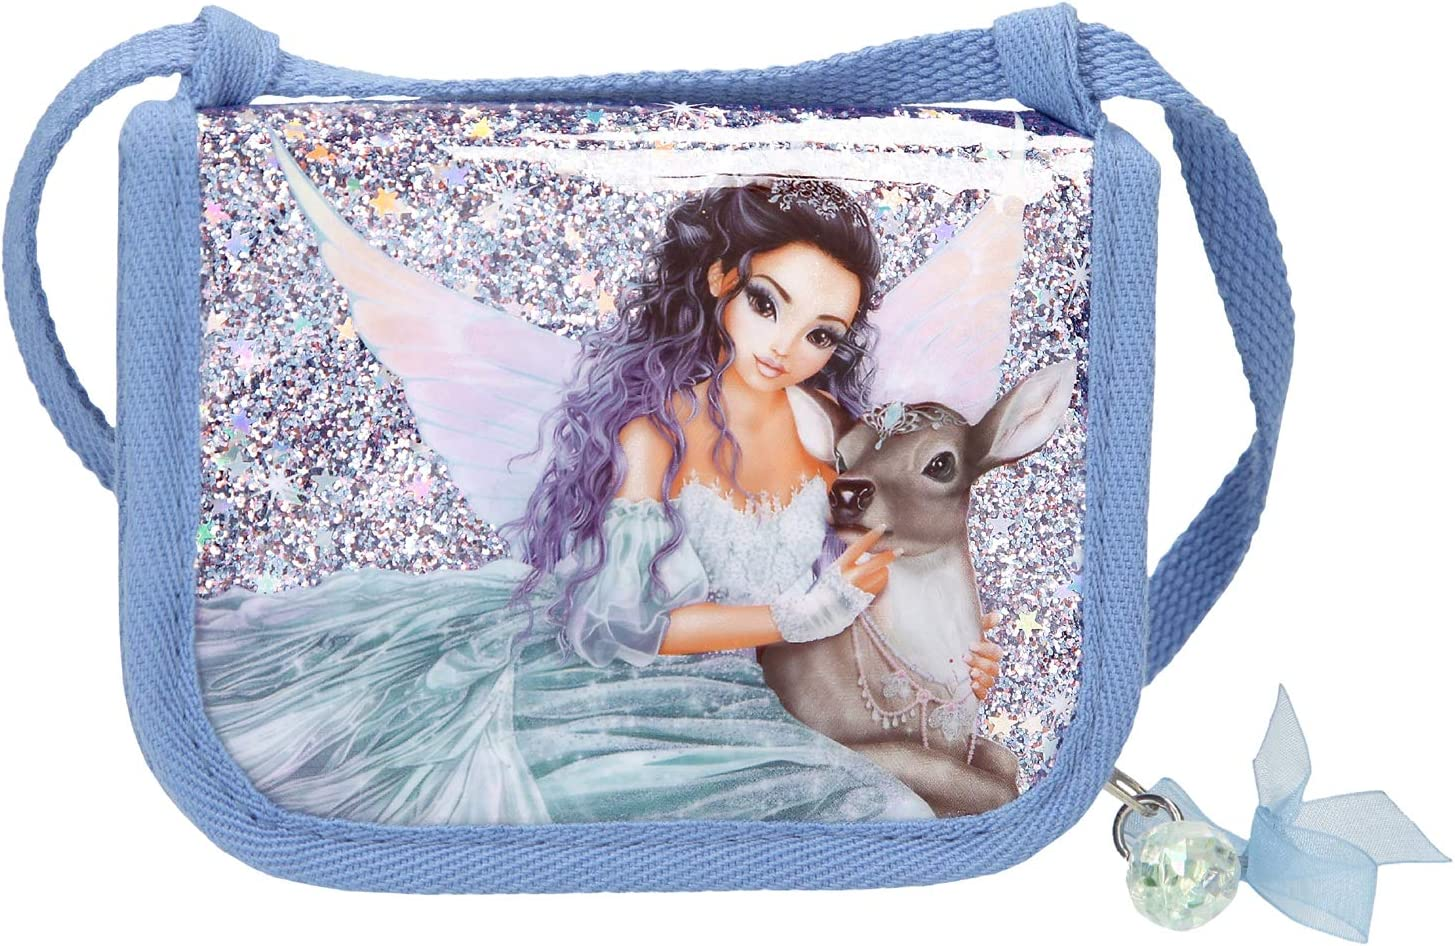 Depesche 11045 Brustbeutel ca Fantasy Model Mermaid 13 x 10 x 2 cm blau